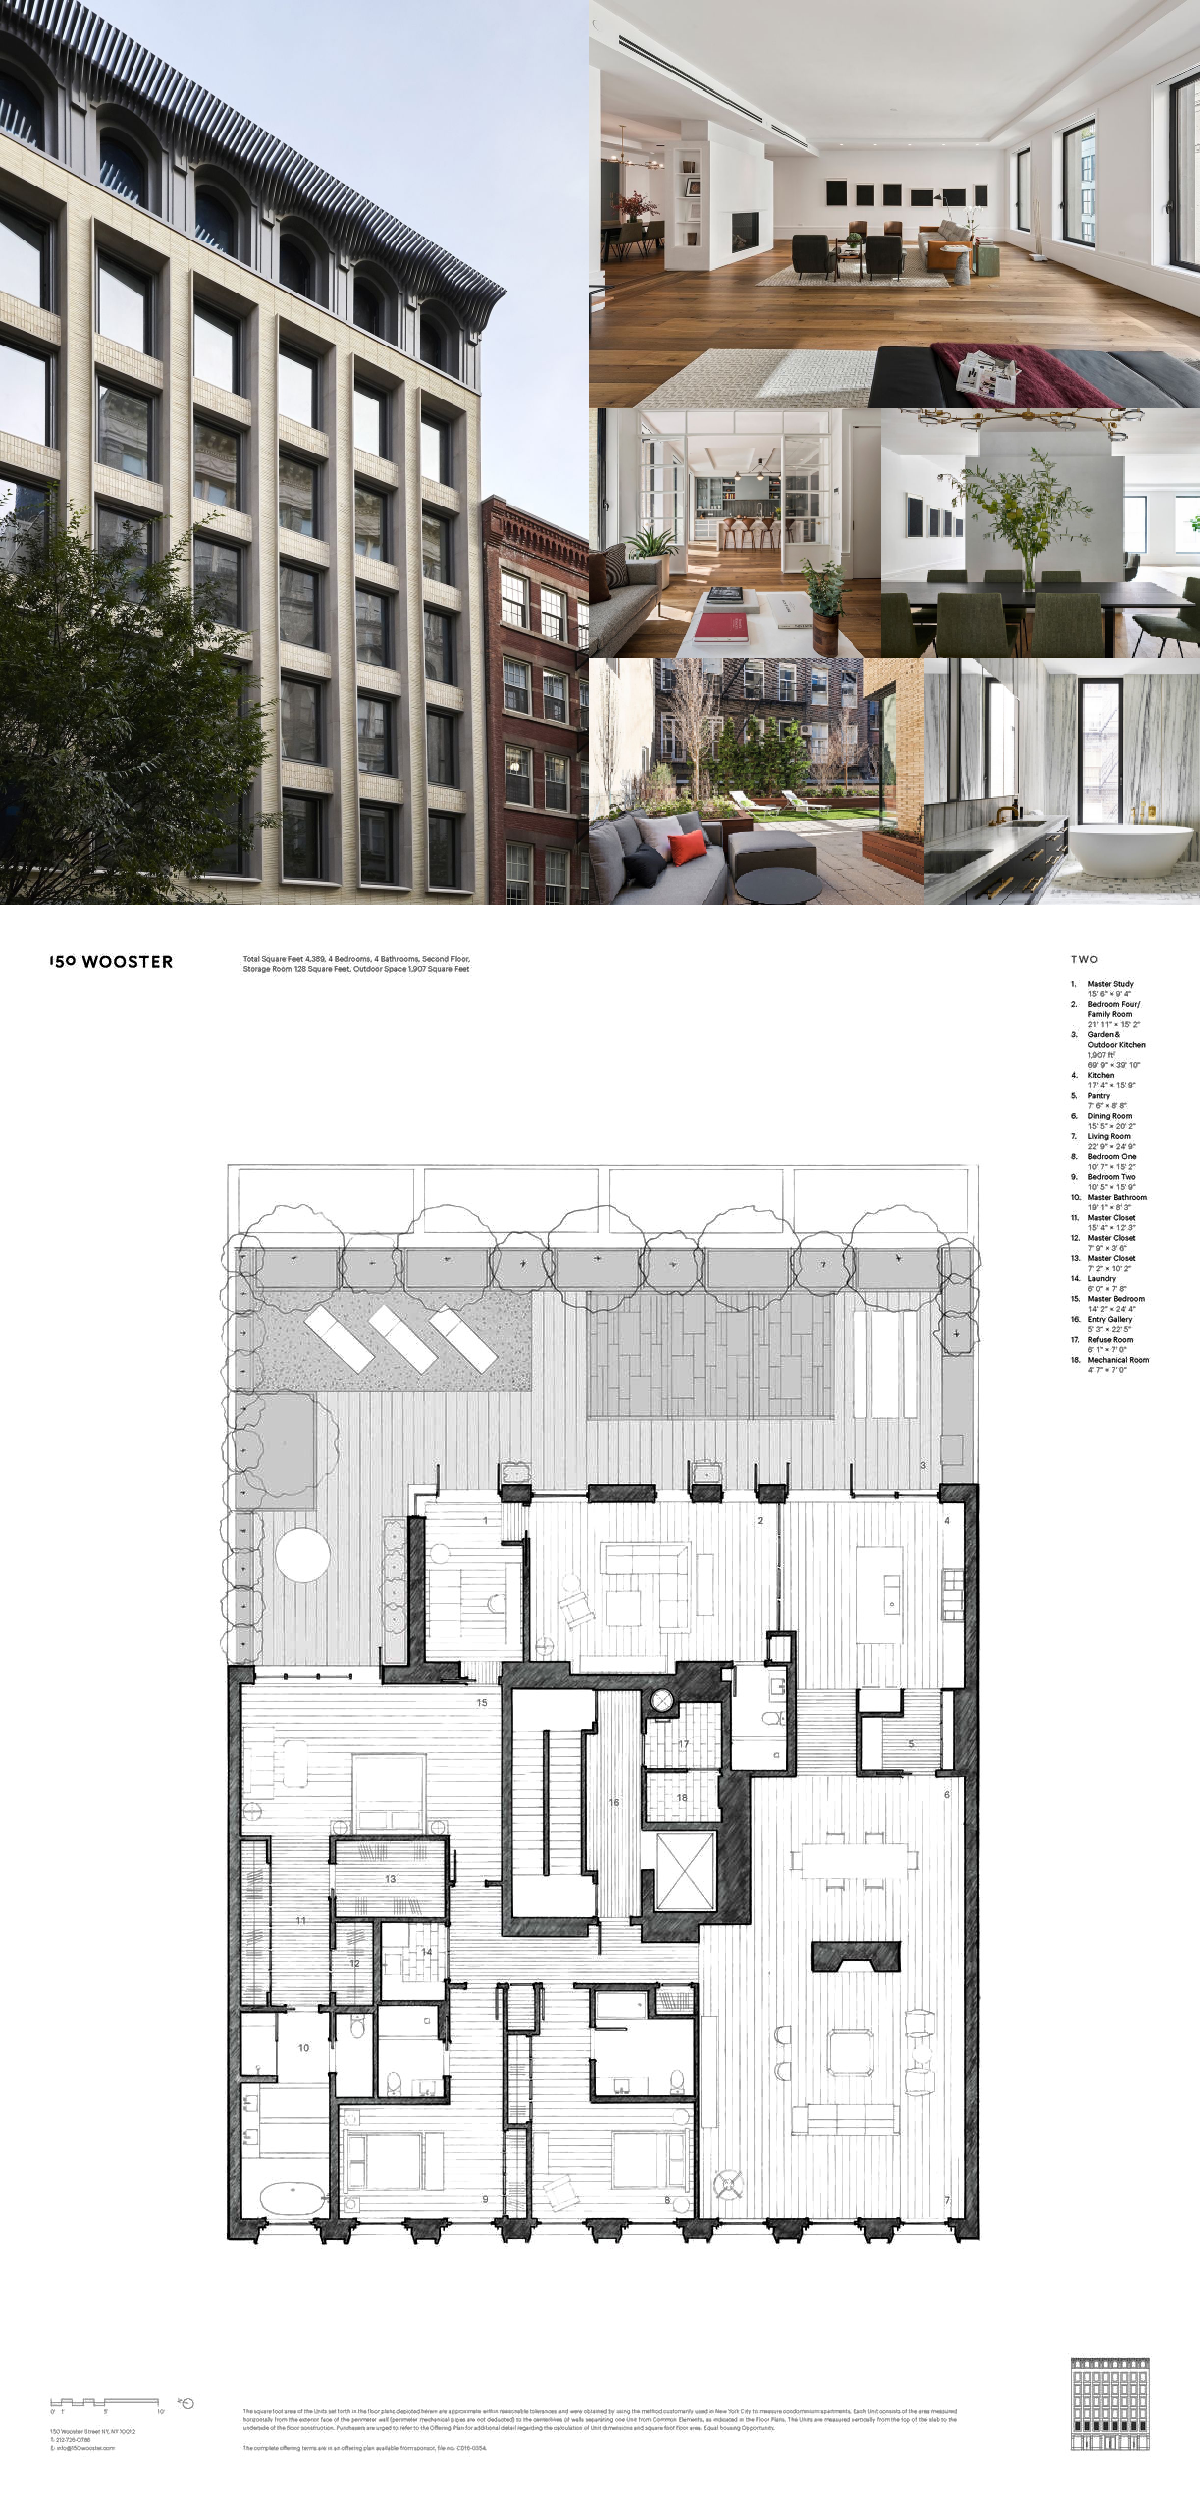 150 Wooster St Loft 2 New York Ny 10012 Core Real Estate Penthouse Apartment Floor Plan Loft Floor Plans Luxury Loft